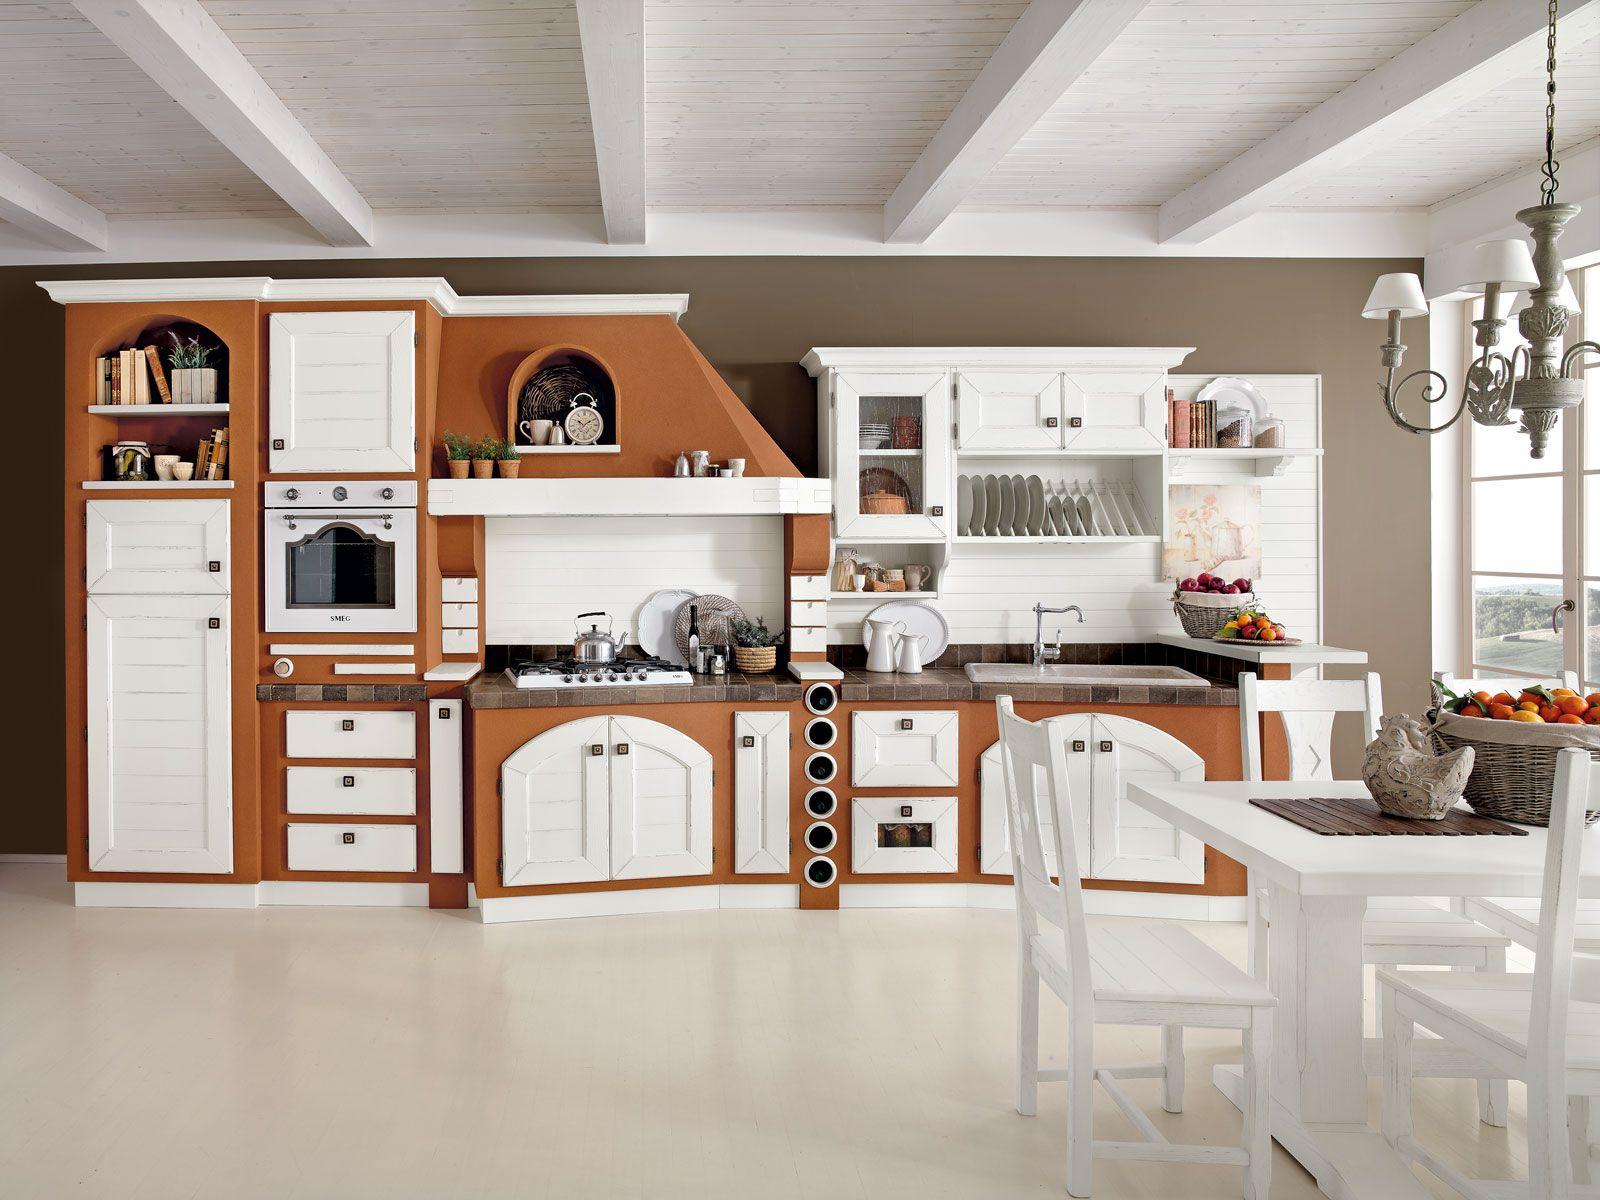 Cucine effetto muratura. Vera o finta? | Pinterest | Dining and Kitchens